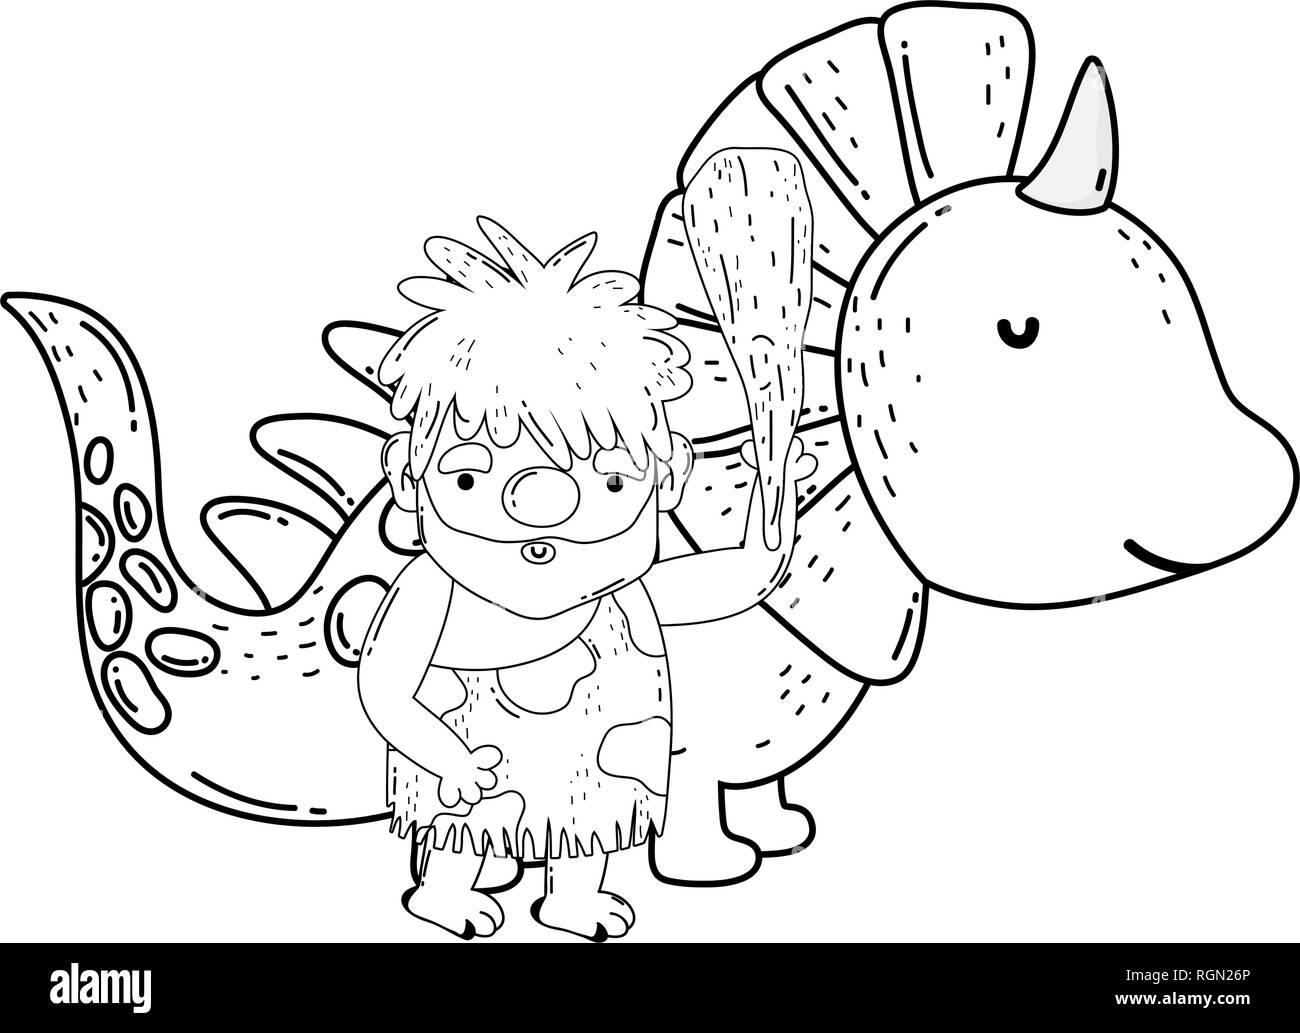 caveman with dinosaur characters - Stock Image